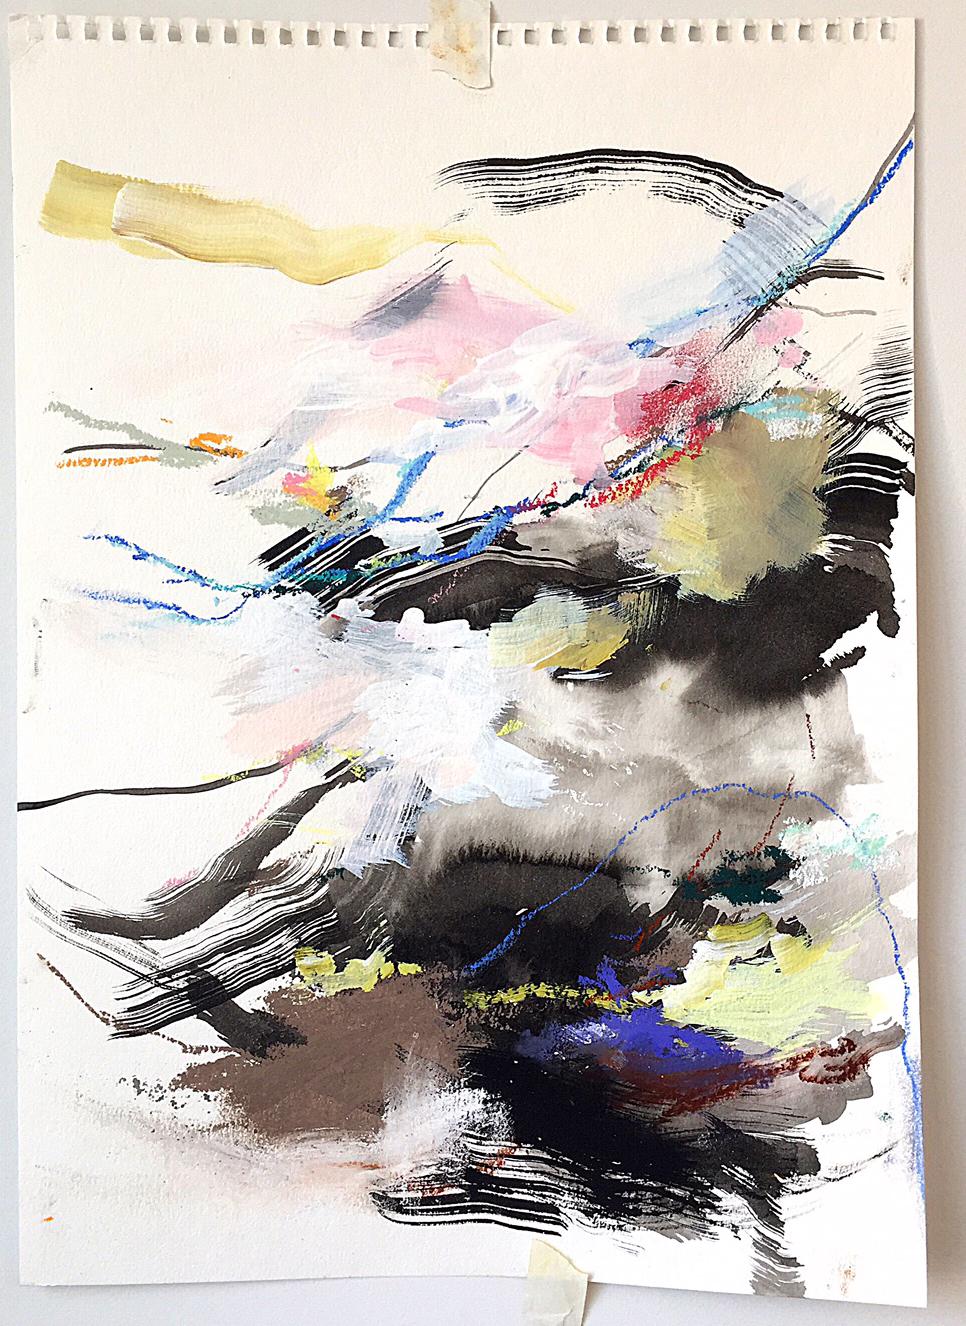 Untitled, 11 x 15